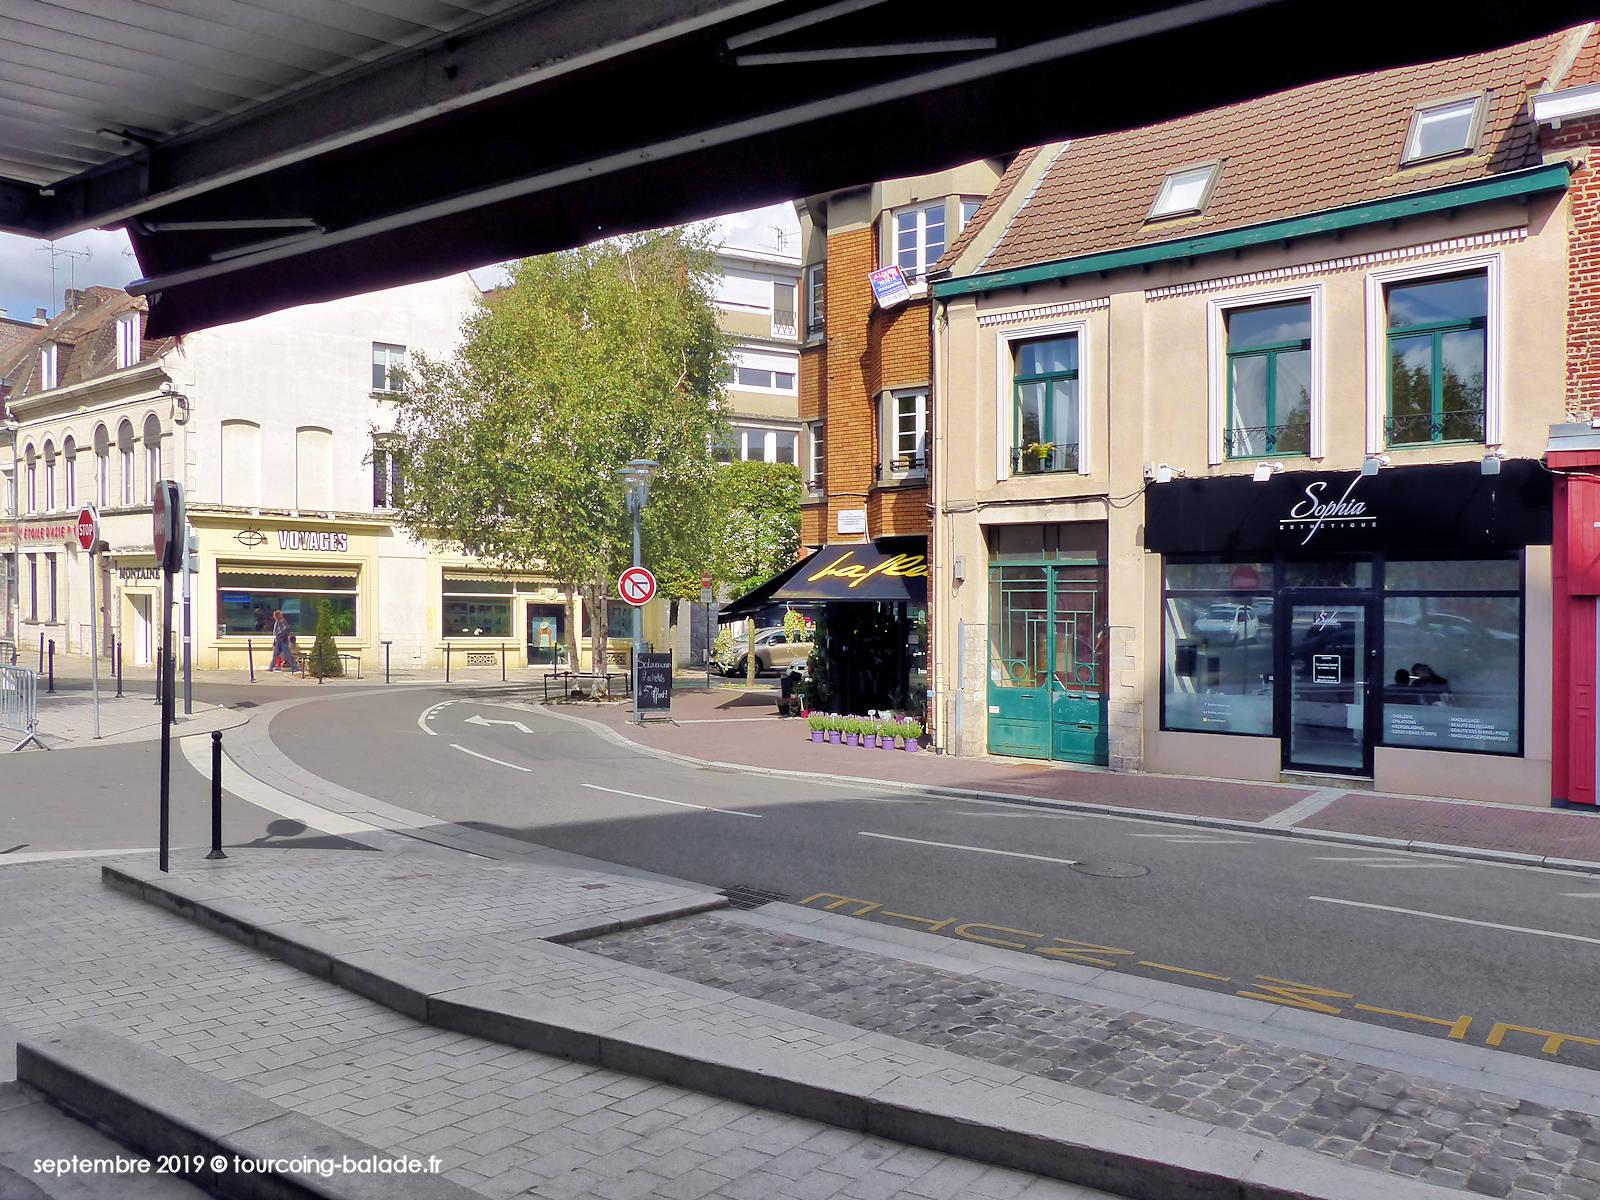 Rue de Tournai, Tourcoing - Sophia Esthétique